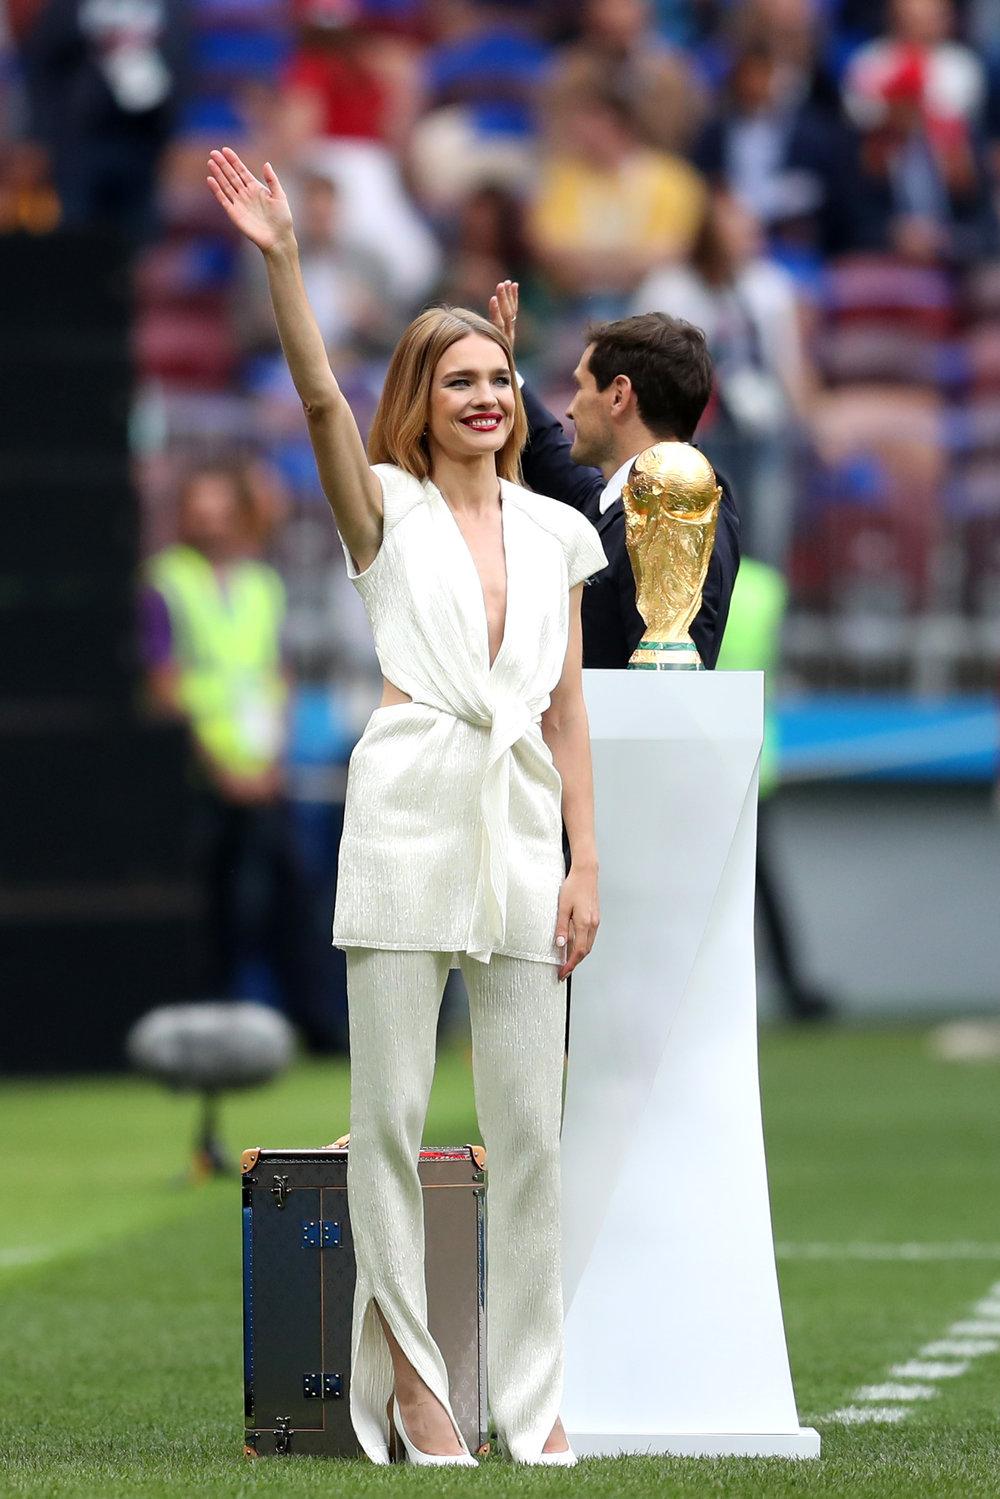 Natalia Vodianova - Fifa Worl Cup 2018.jpg